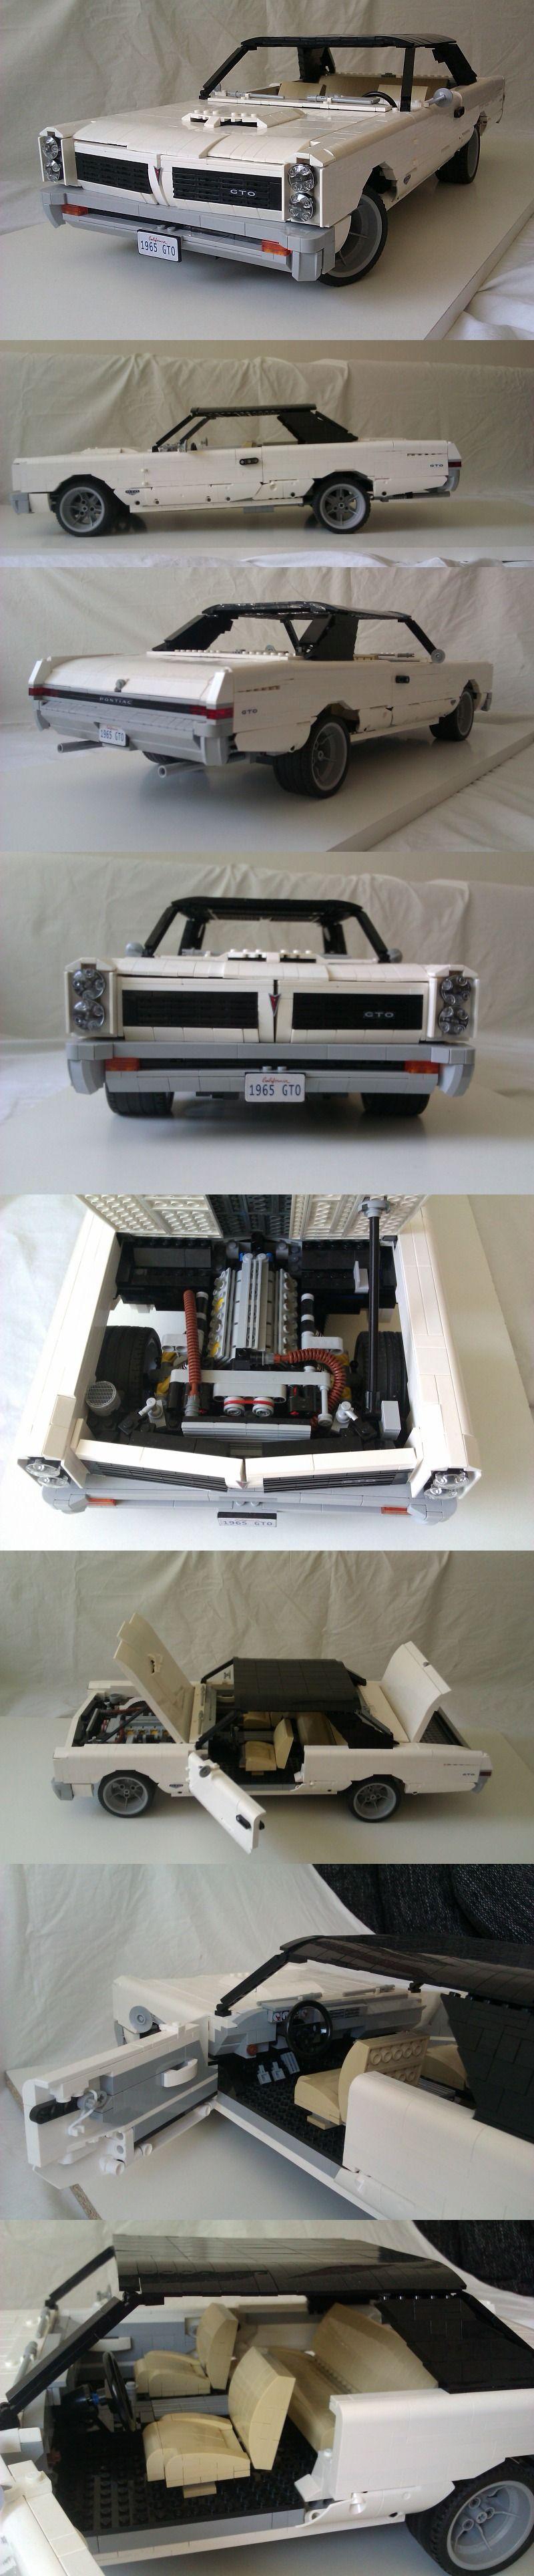 1965 pontiac gto wheels pinterest lego lego fahrzeuge und lego ideen. Black Bedroom Furniture Sets. Home Design Ideas